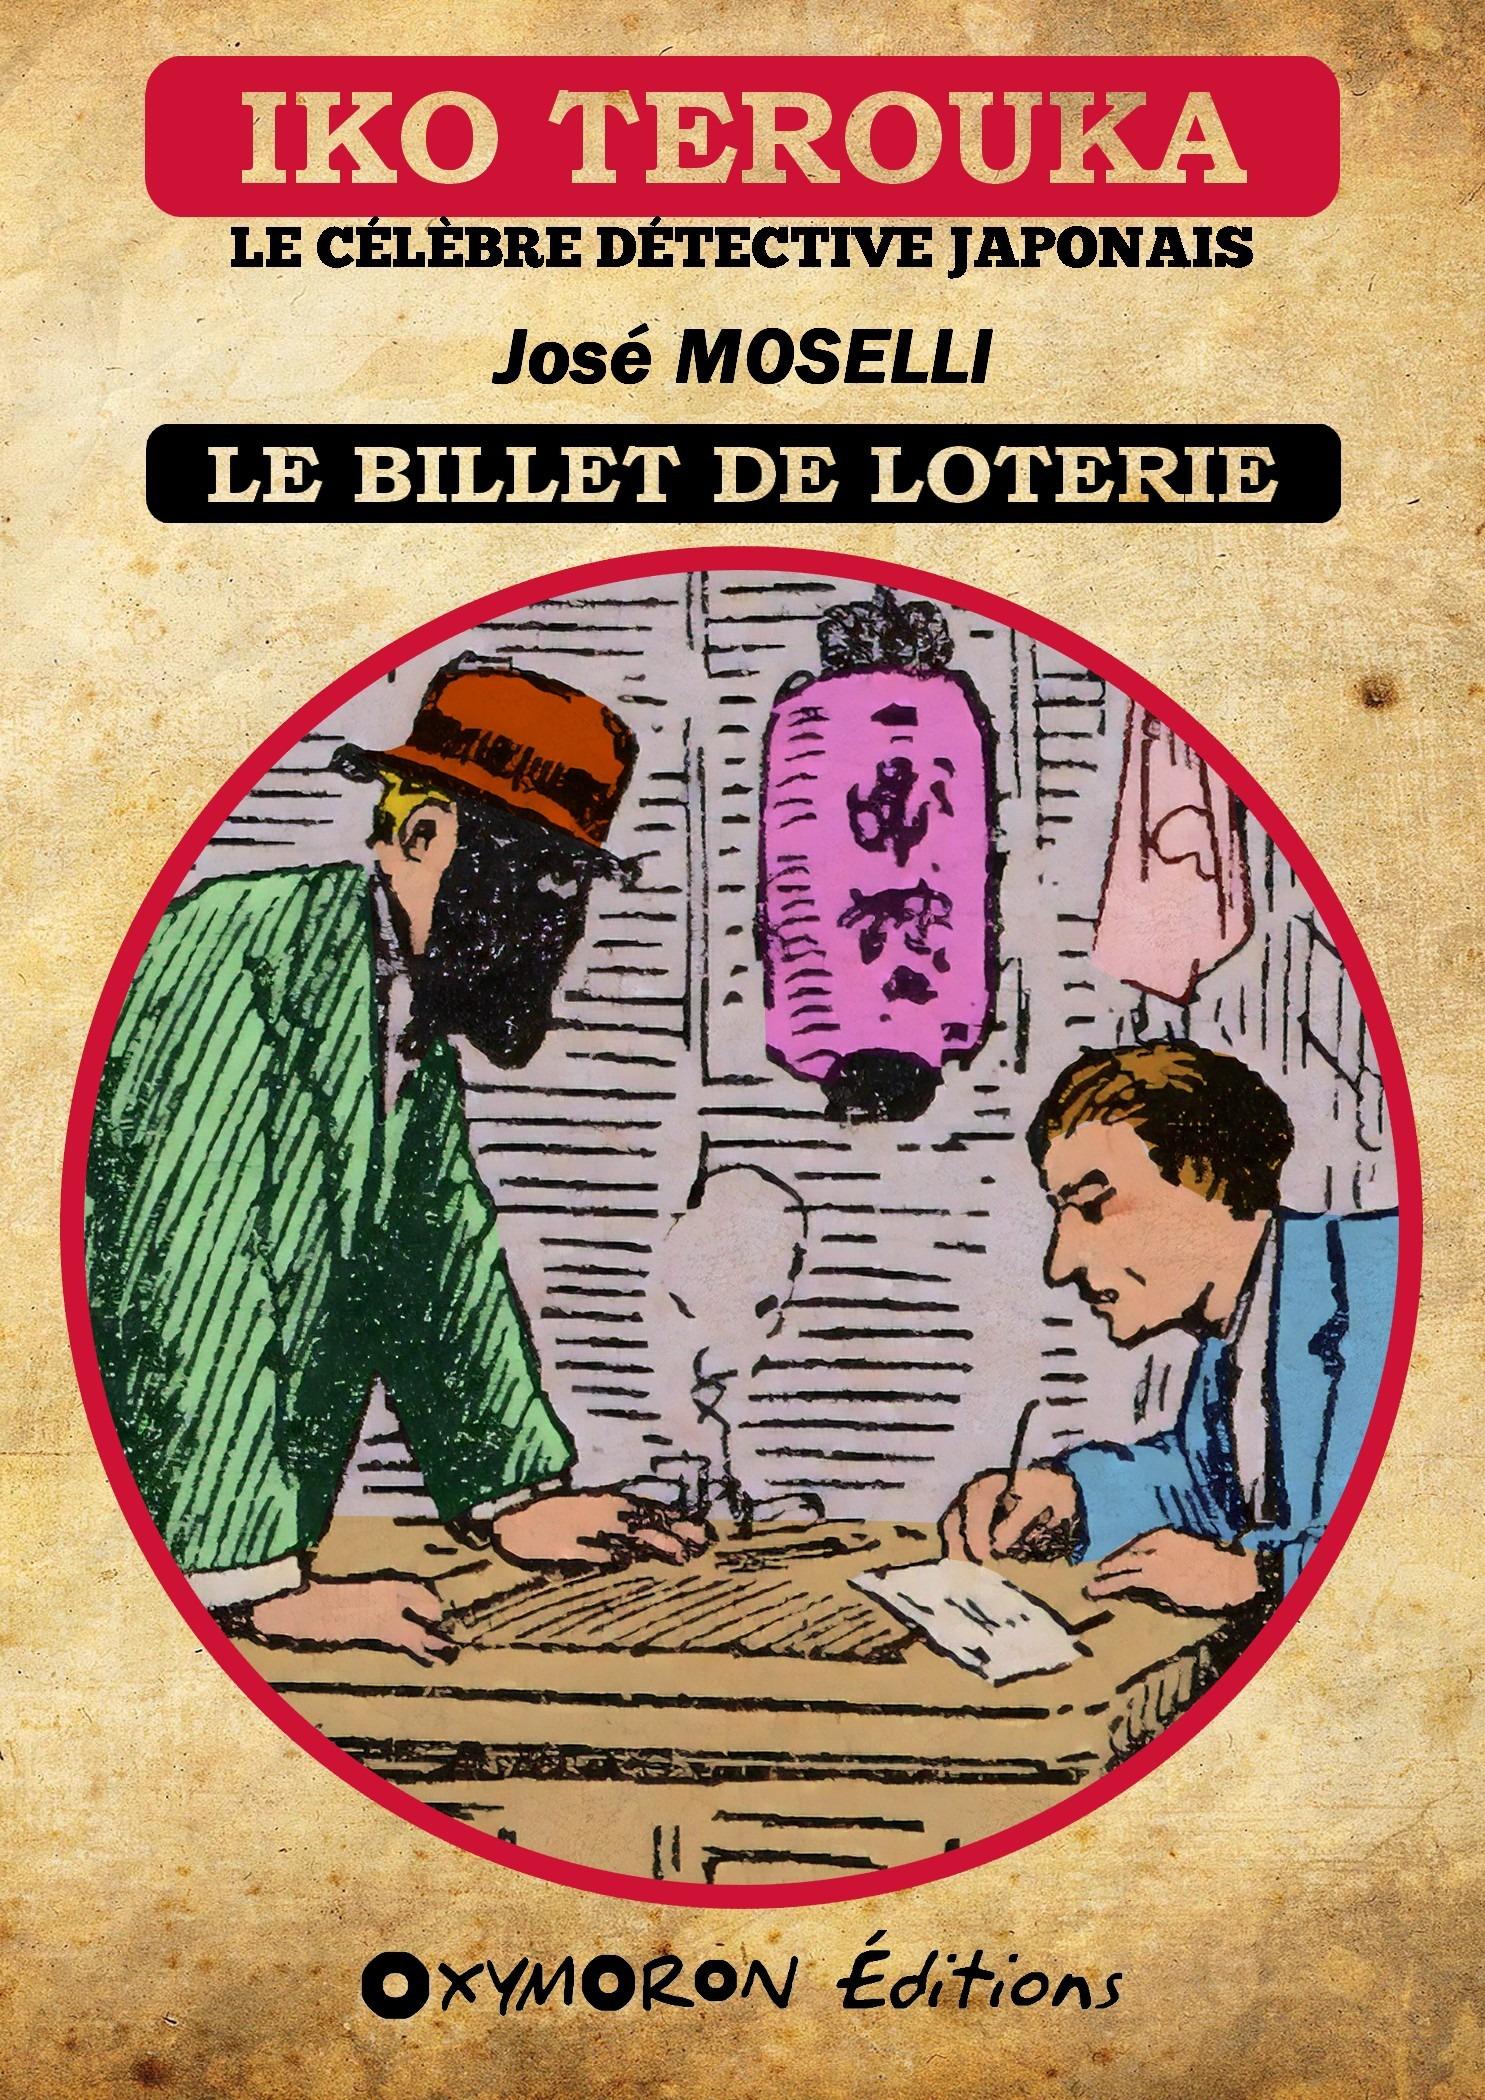 Iko Terouka - Le billet de loterie  - Jose Moselli